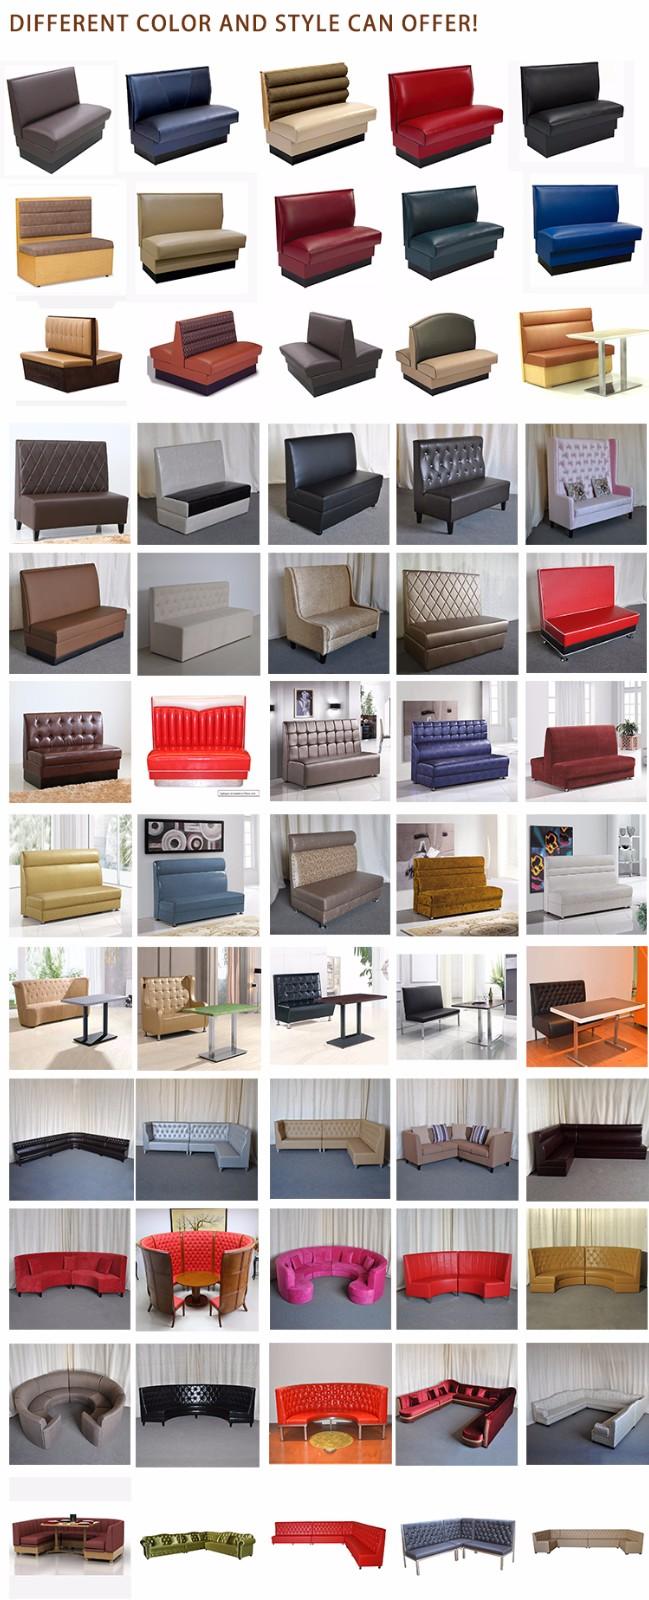 product-Uptop Furnishings-SP-KS421 New cafe furntiure design sofa restaurant booth-img-1